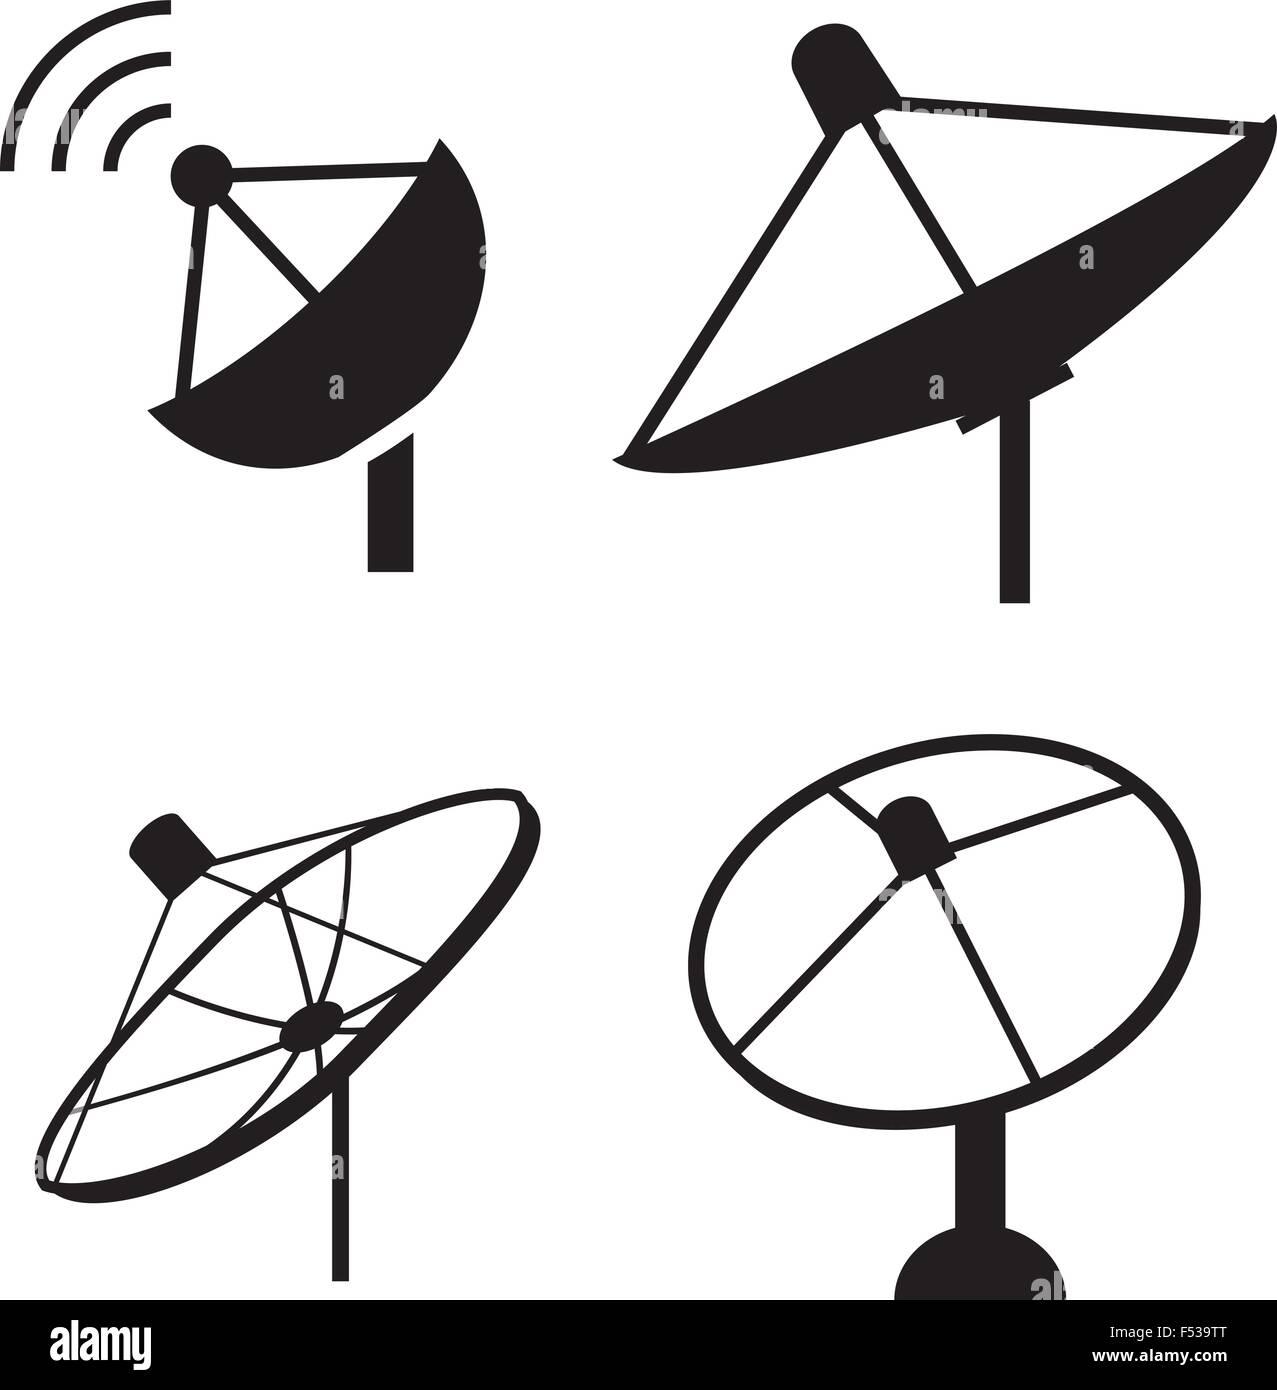 Set of silhouette satellite dish icon, vector - Stock Image